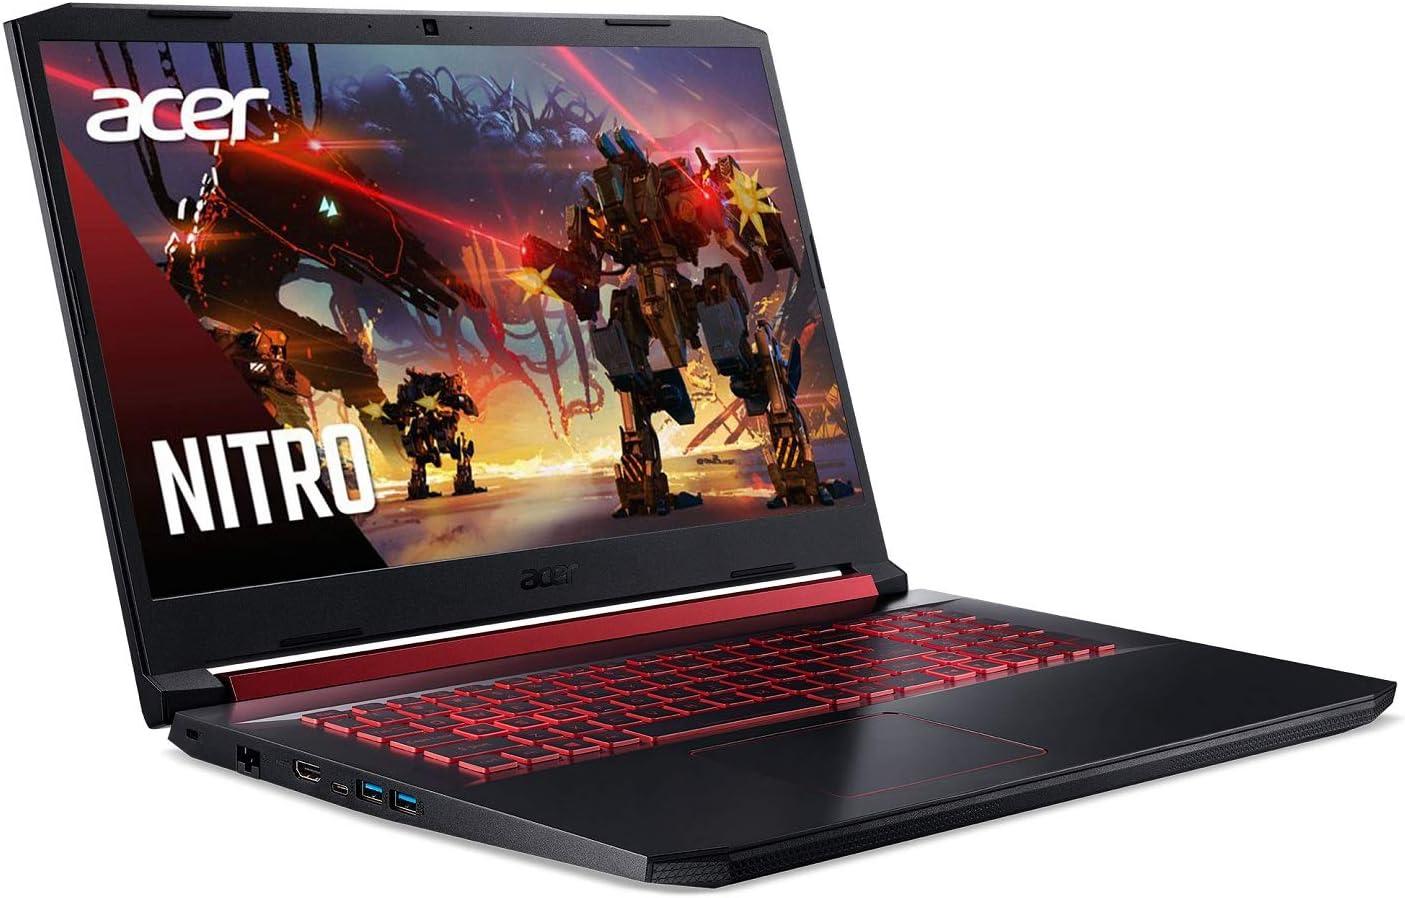 71Cl%2Bc3qLlL. AC SL1500 Best Laptops for Seniors & Elderly for 2021 Reviews